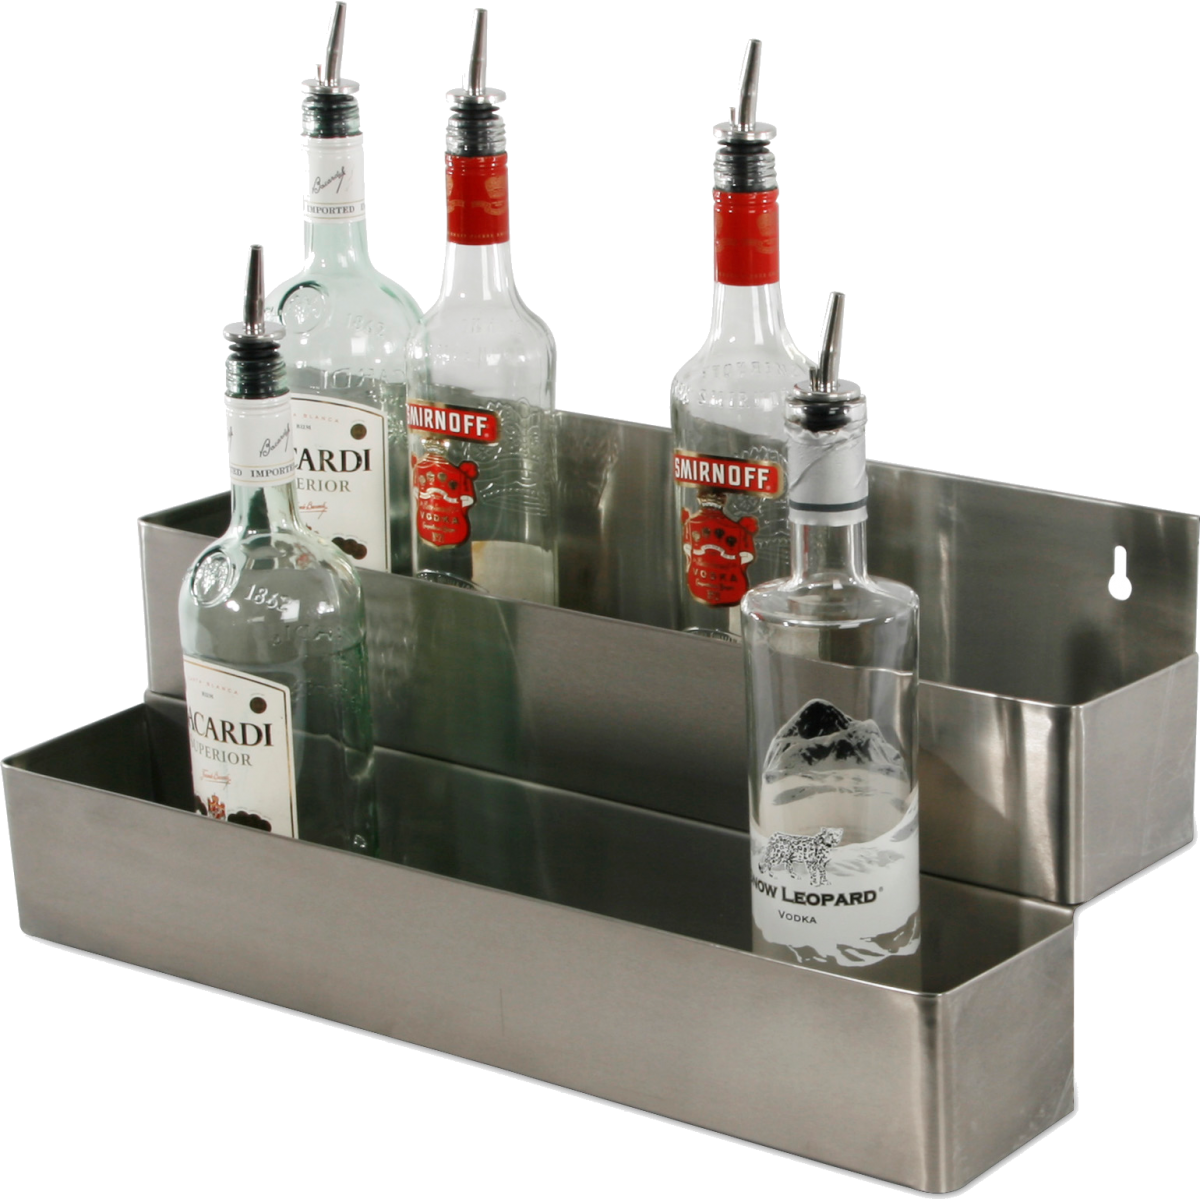 Speed Rack dobbelt til 2 x 5 flasker